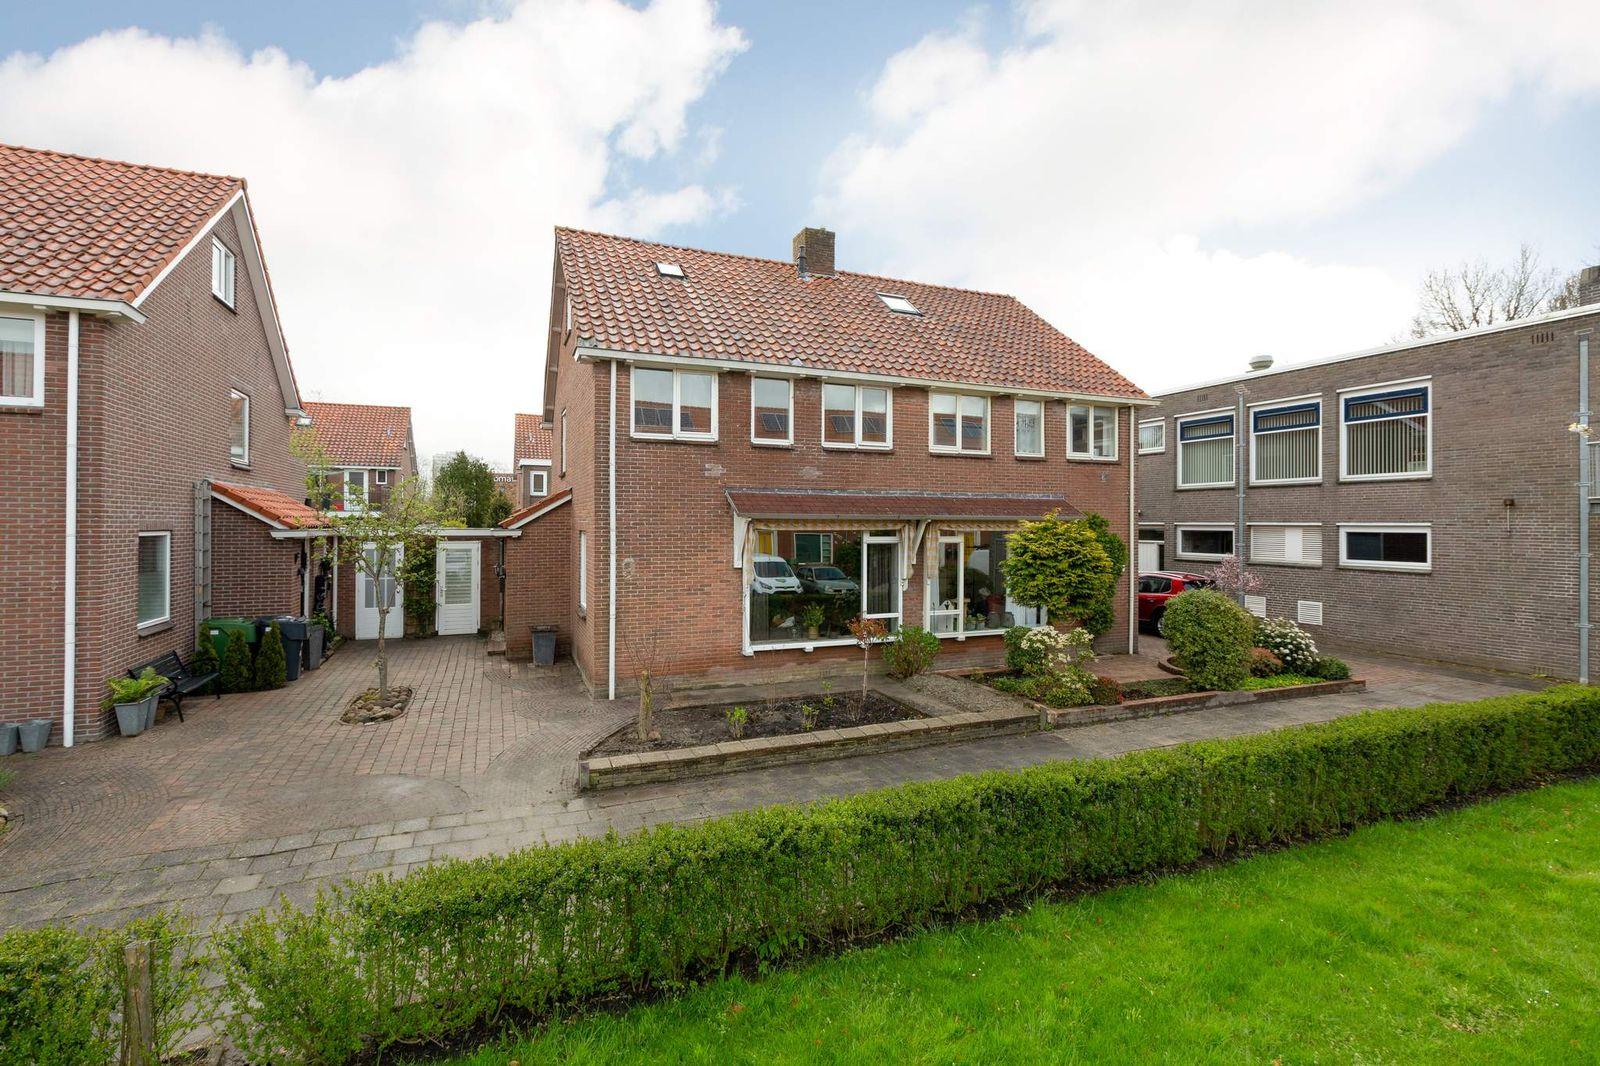 Arubastraat 9, Leeuwarden